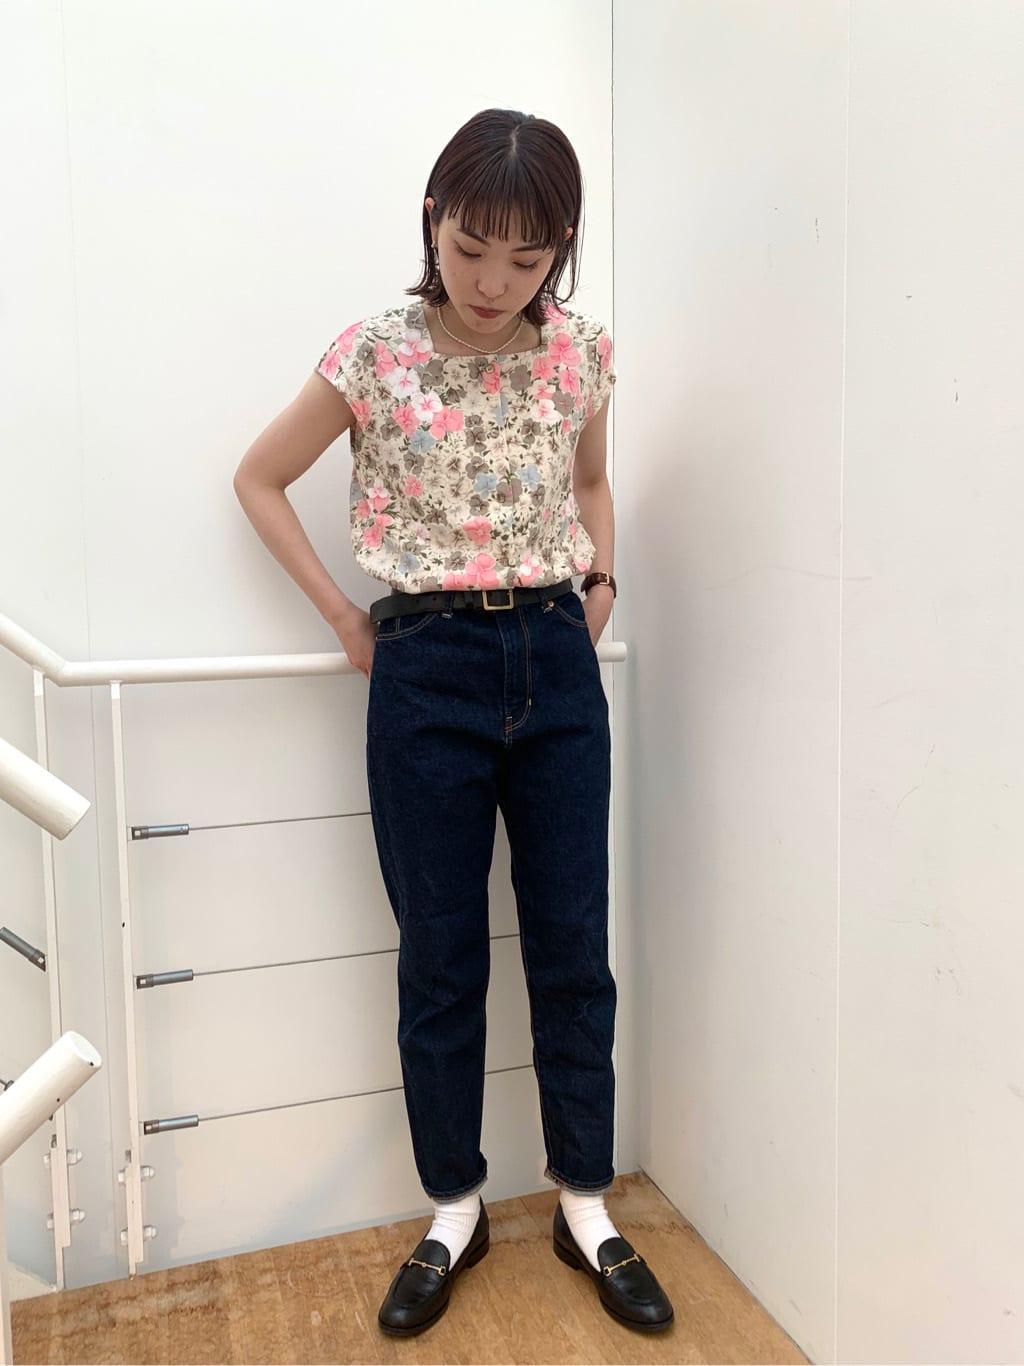 l'atelier du savon 名古屋栄路面 身長:161cm 2021.06.28